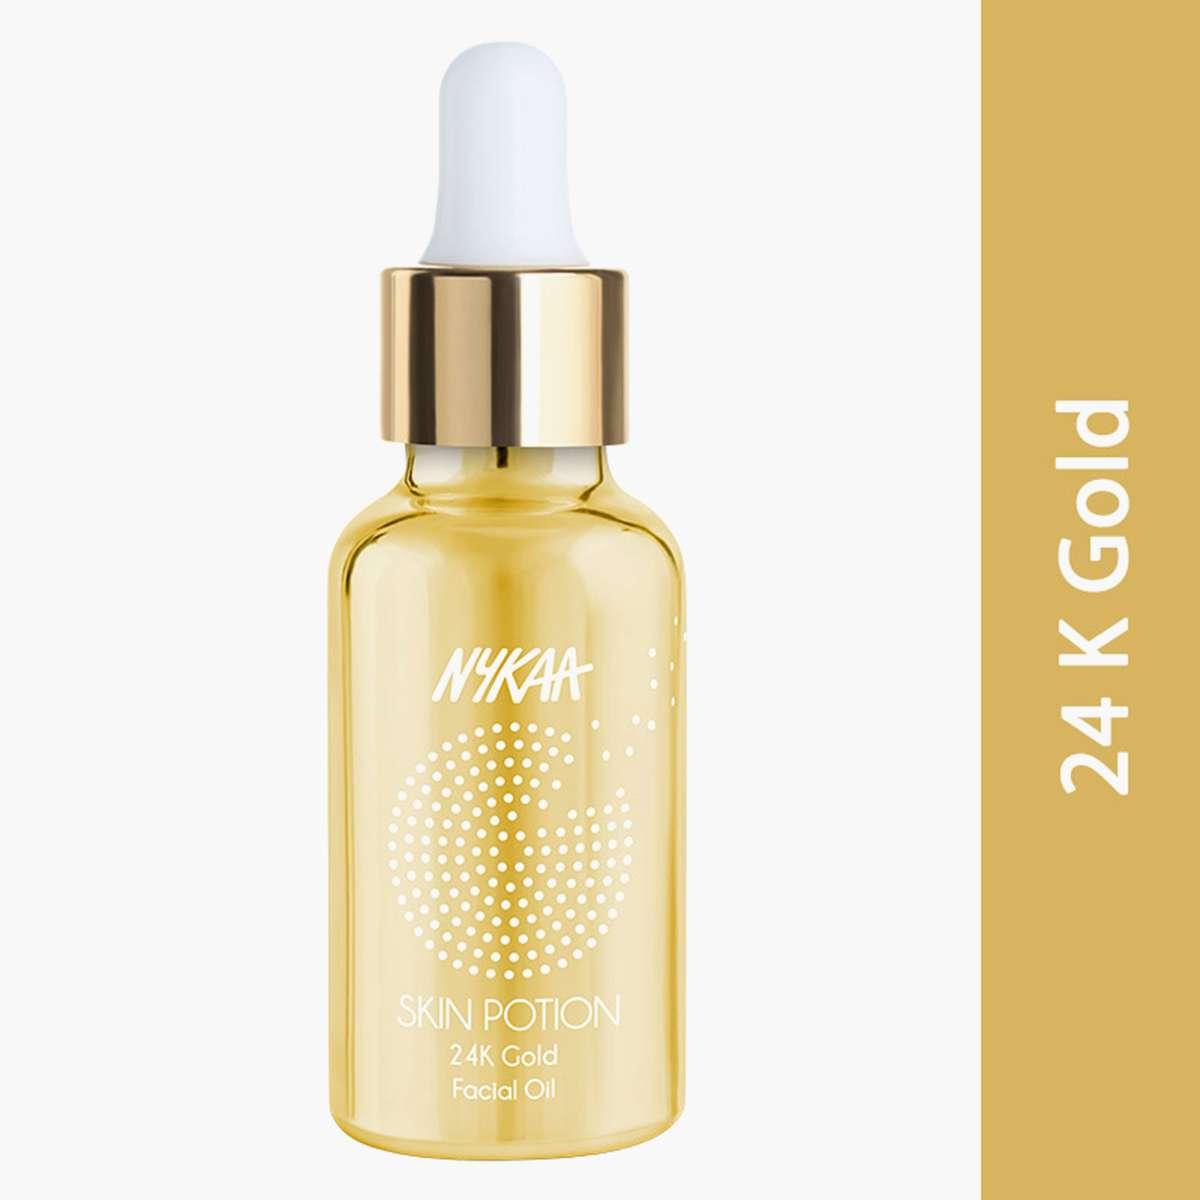 4.NYKAA Skin Potion 24K Gold Face Oil